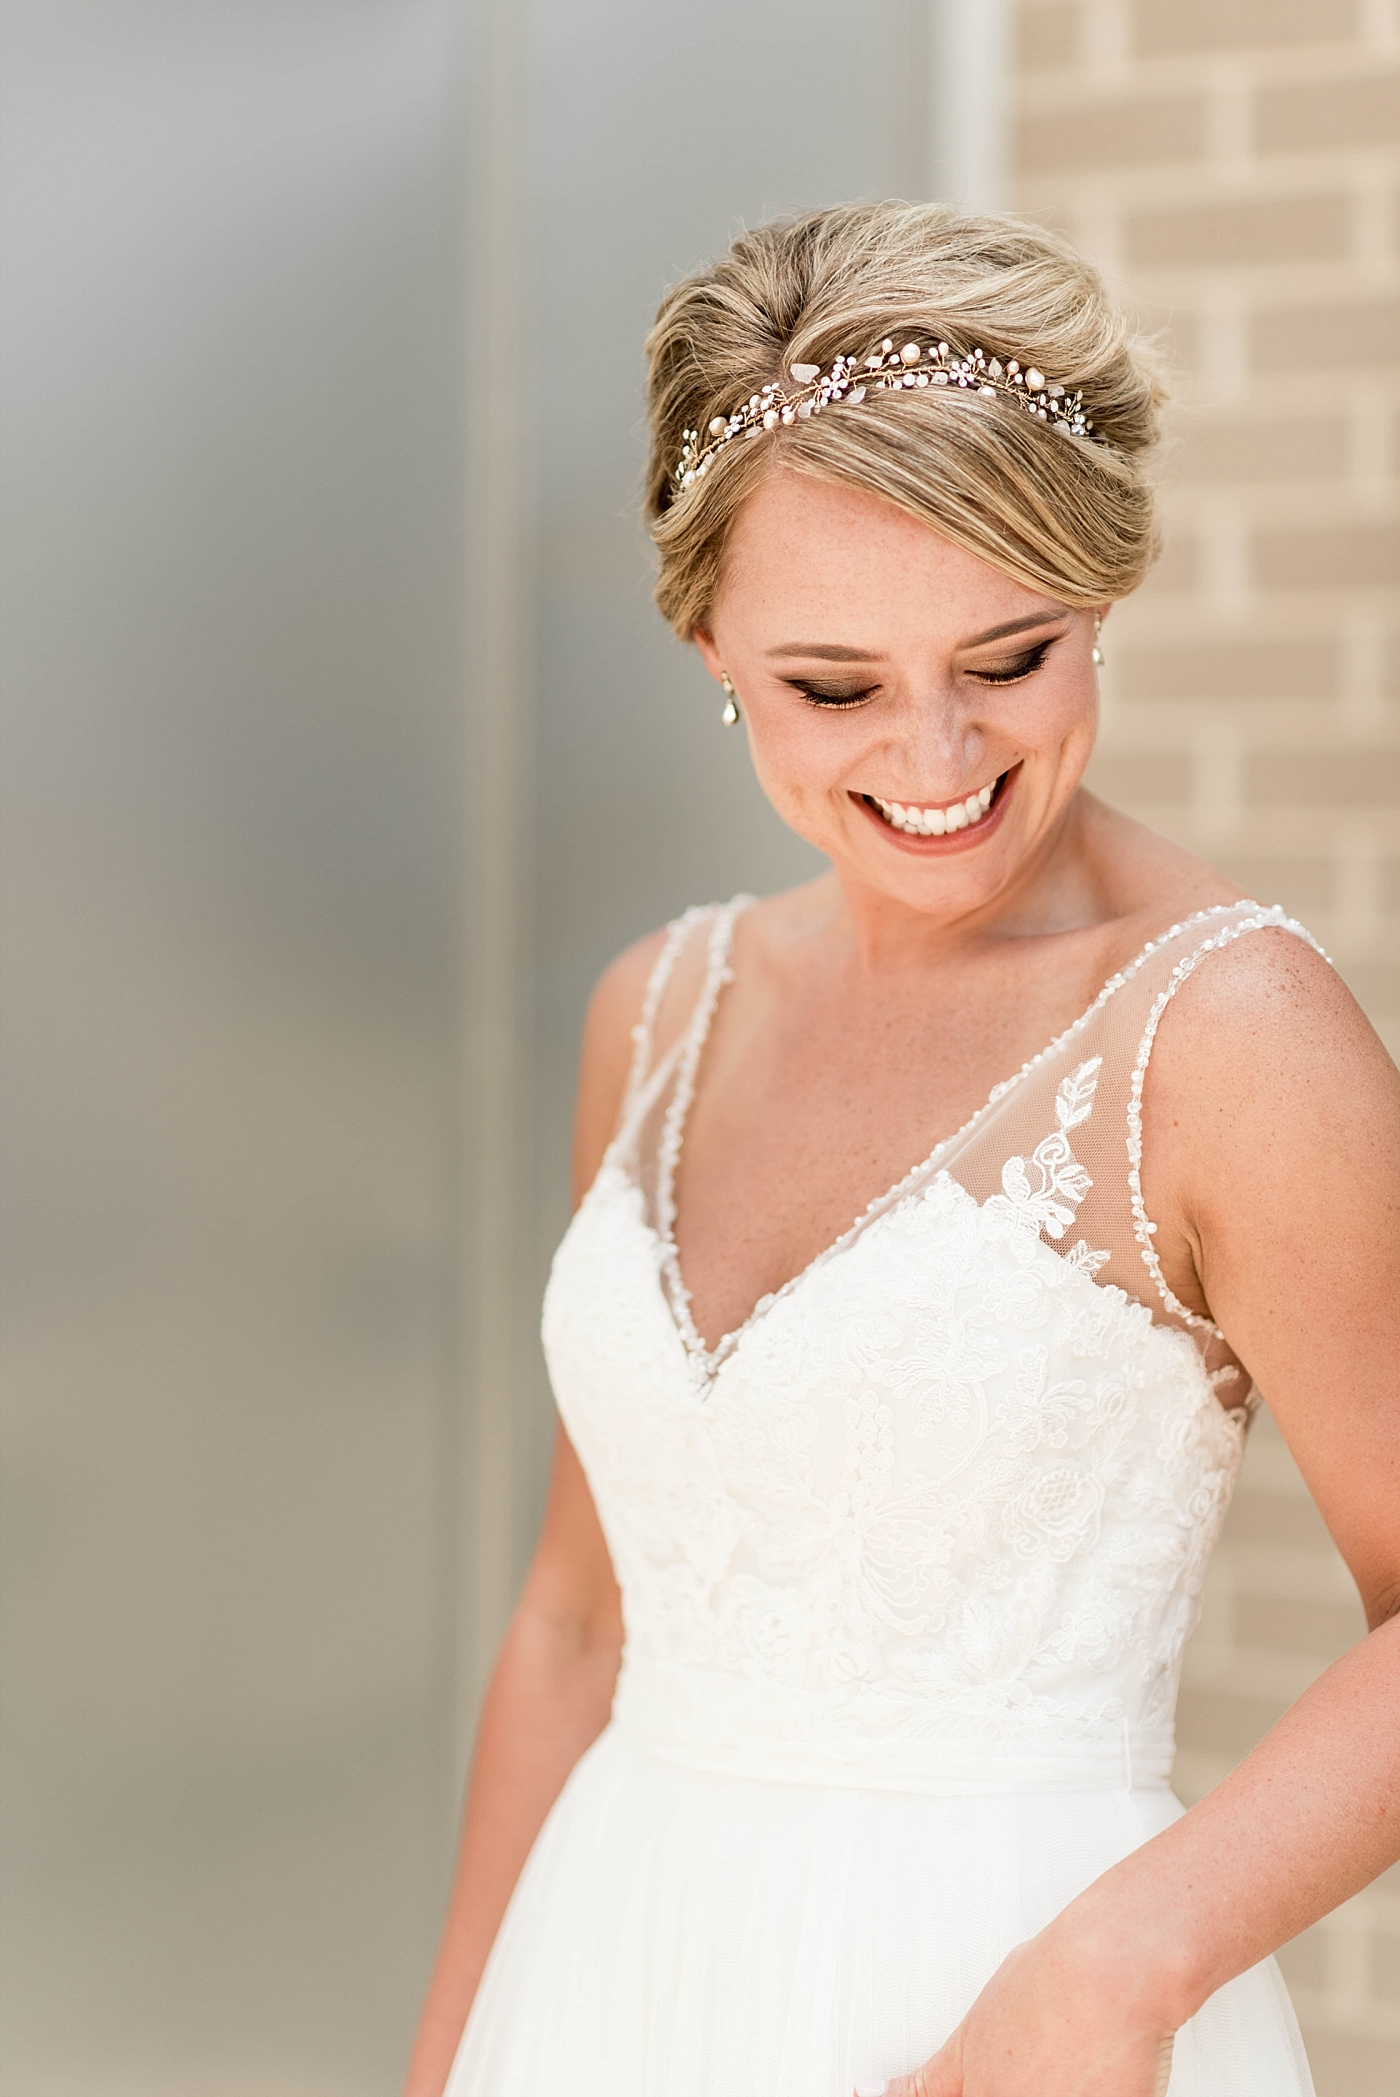 Bridal wedding gown bouquet wedding details wedding